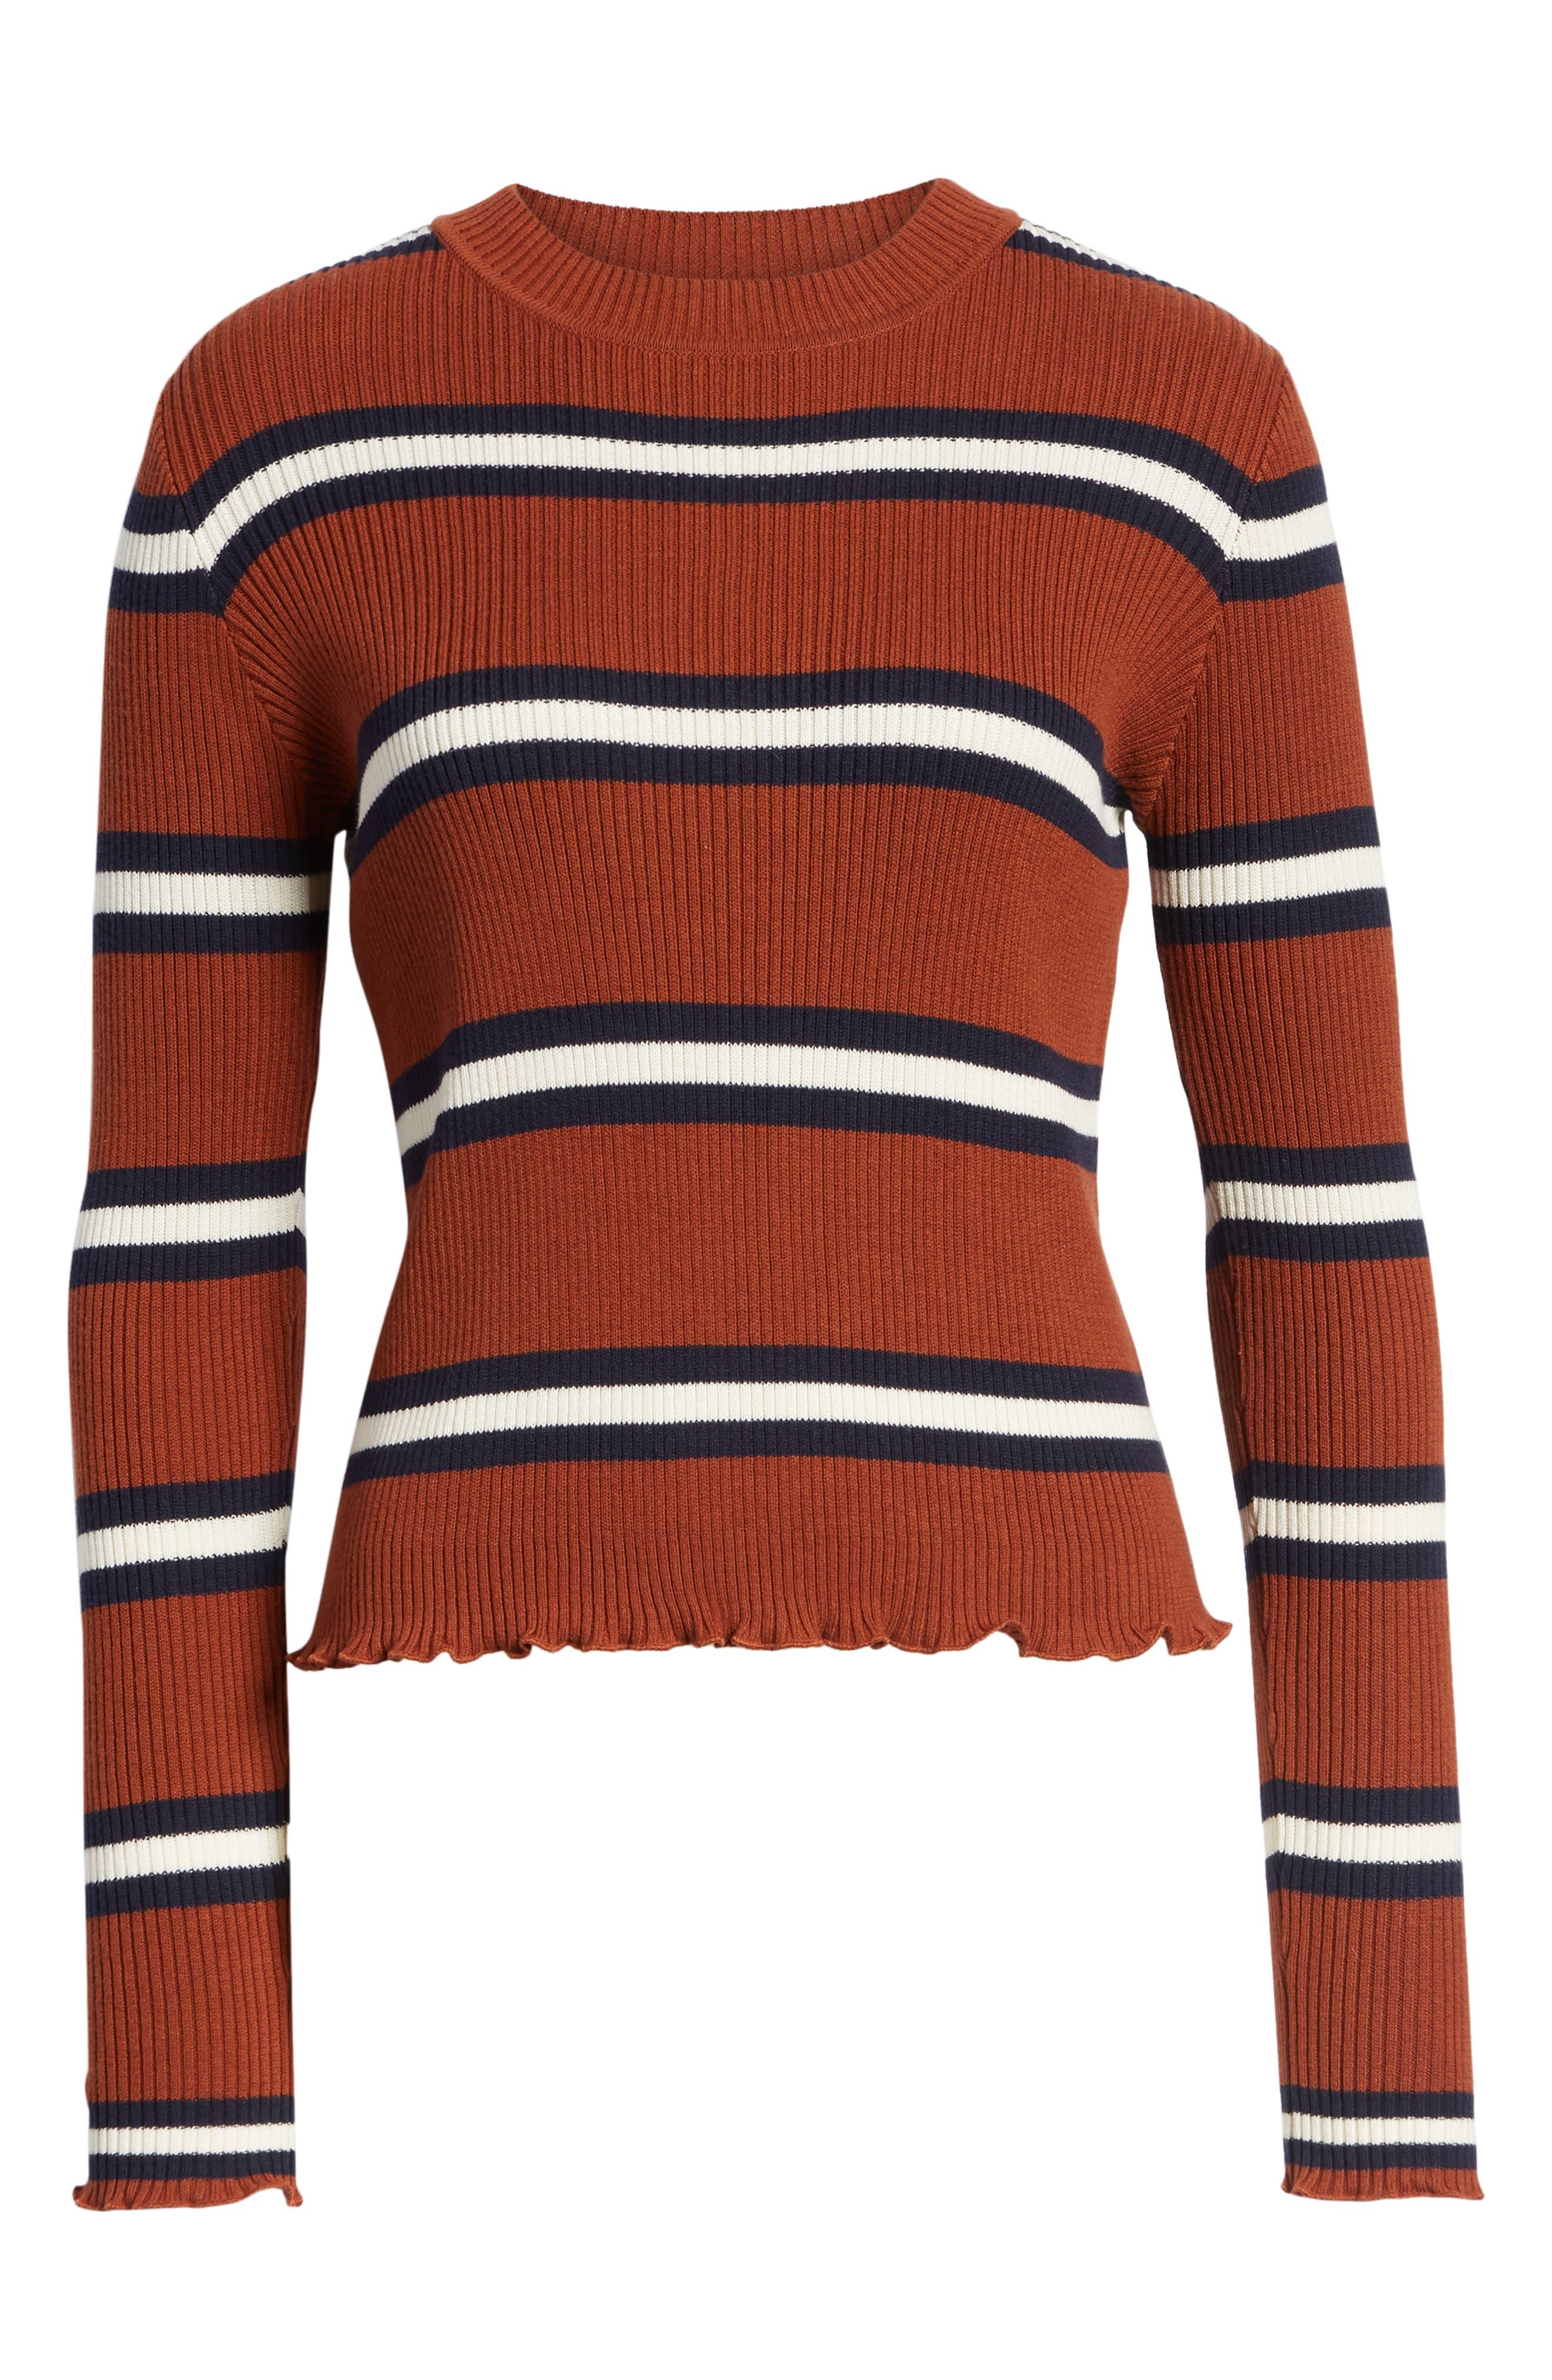 Ribbed Lettuce Edge Stripe Sweater,                             Alternate thumbnail 6, color,                             RUST SEQUOIA CLEO STRIPE